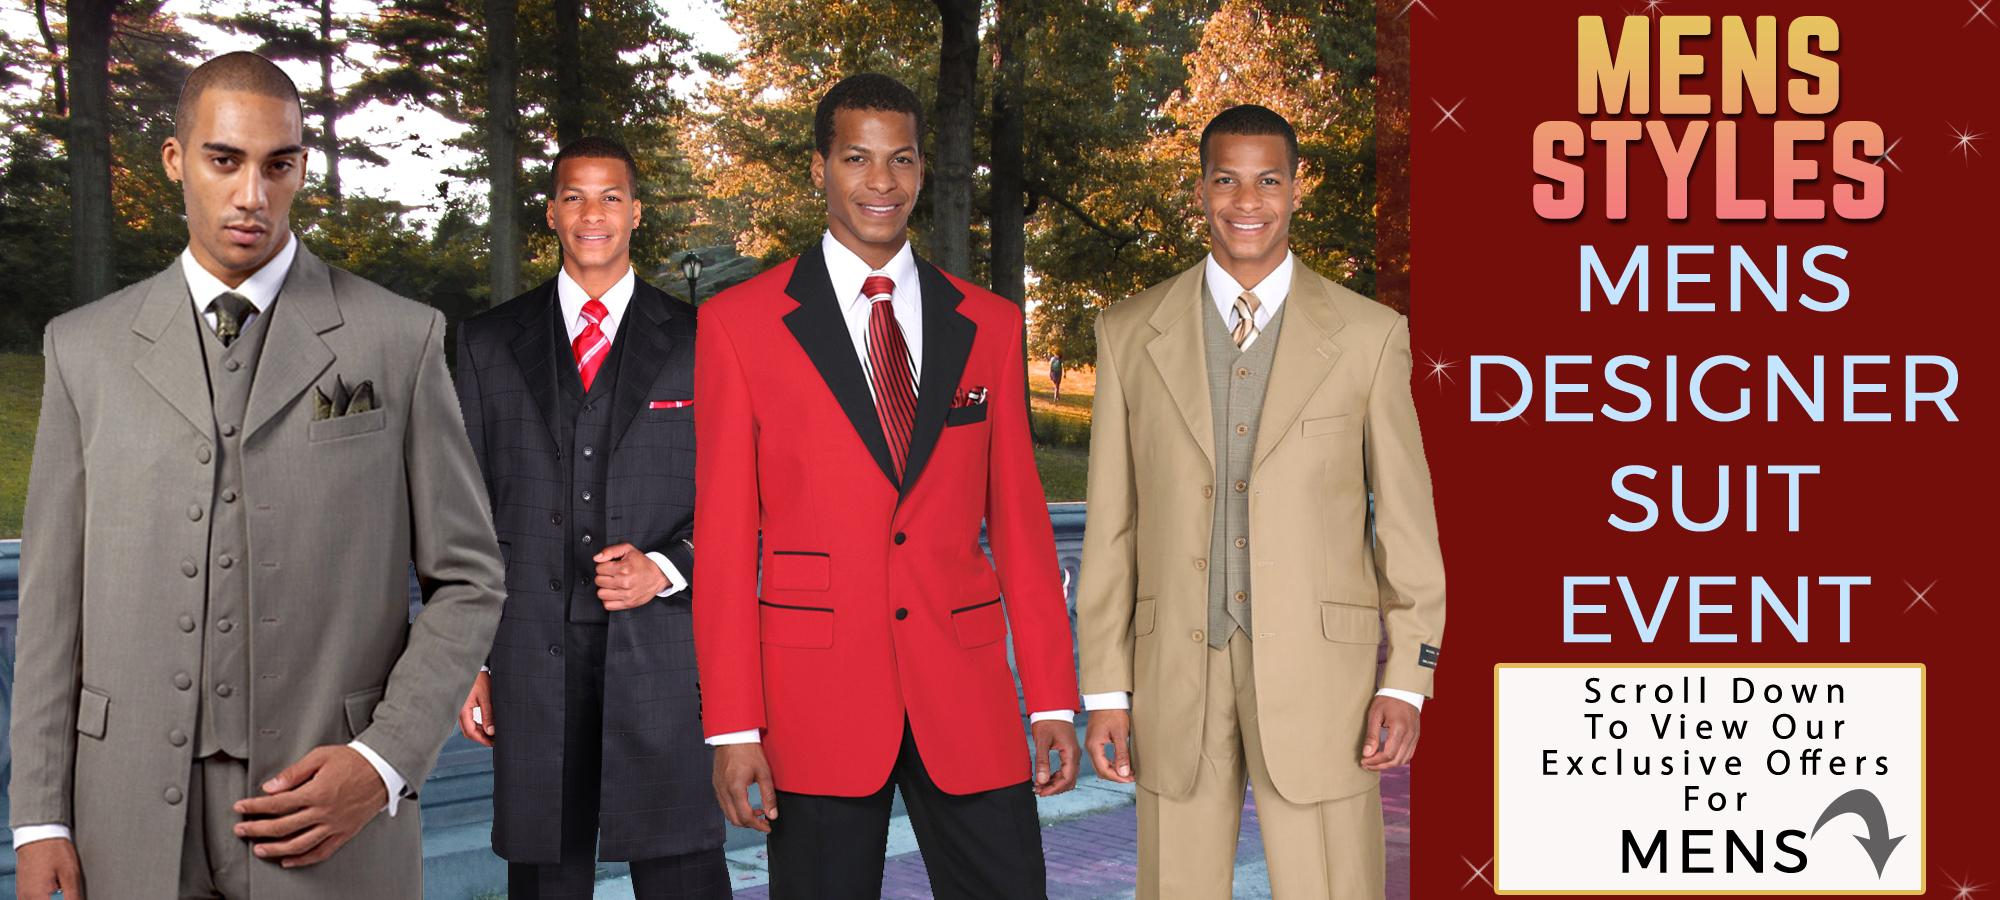 Mens Suits,Mens Walking Suits,Mens Hats,Mens Designer Suits